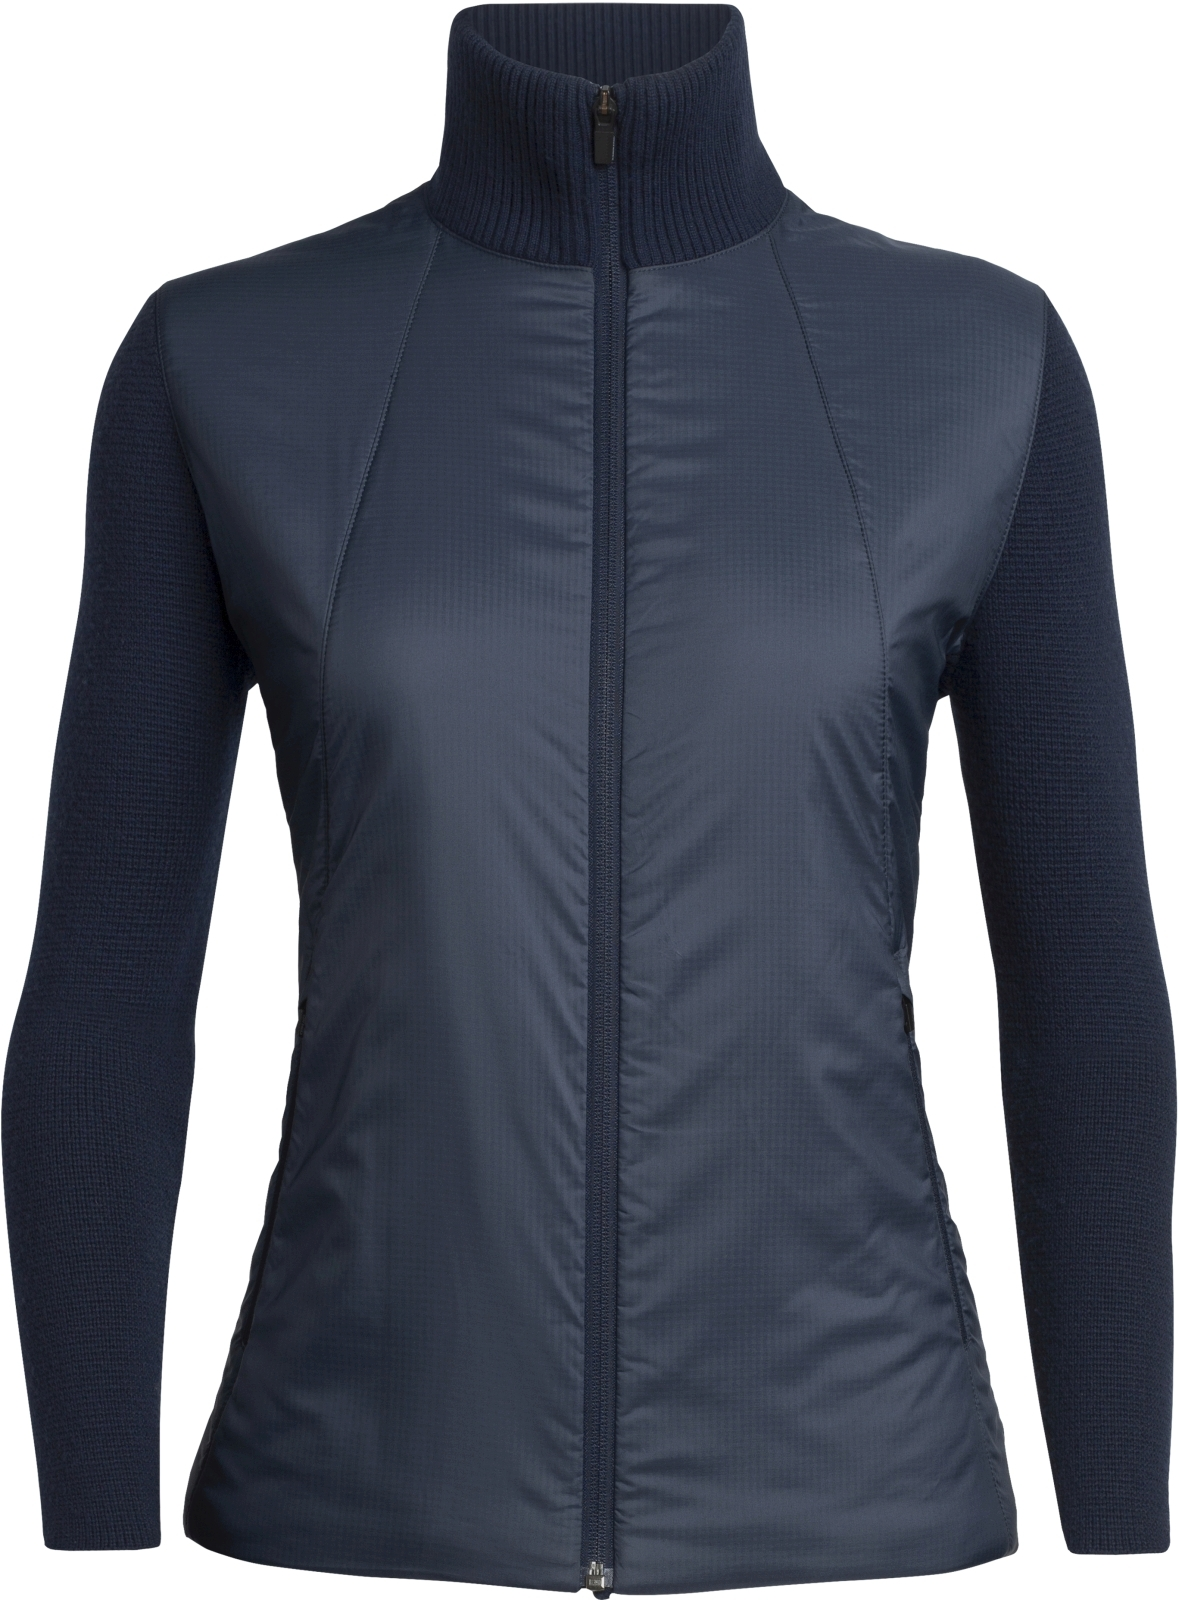 Icebreaker Womens Lumista Hybrid Sweater Jacket - midnight navy L